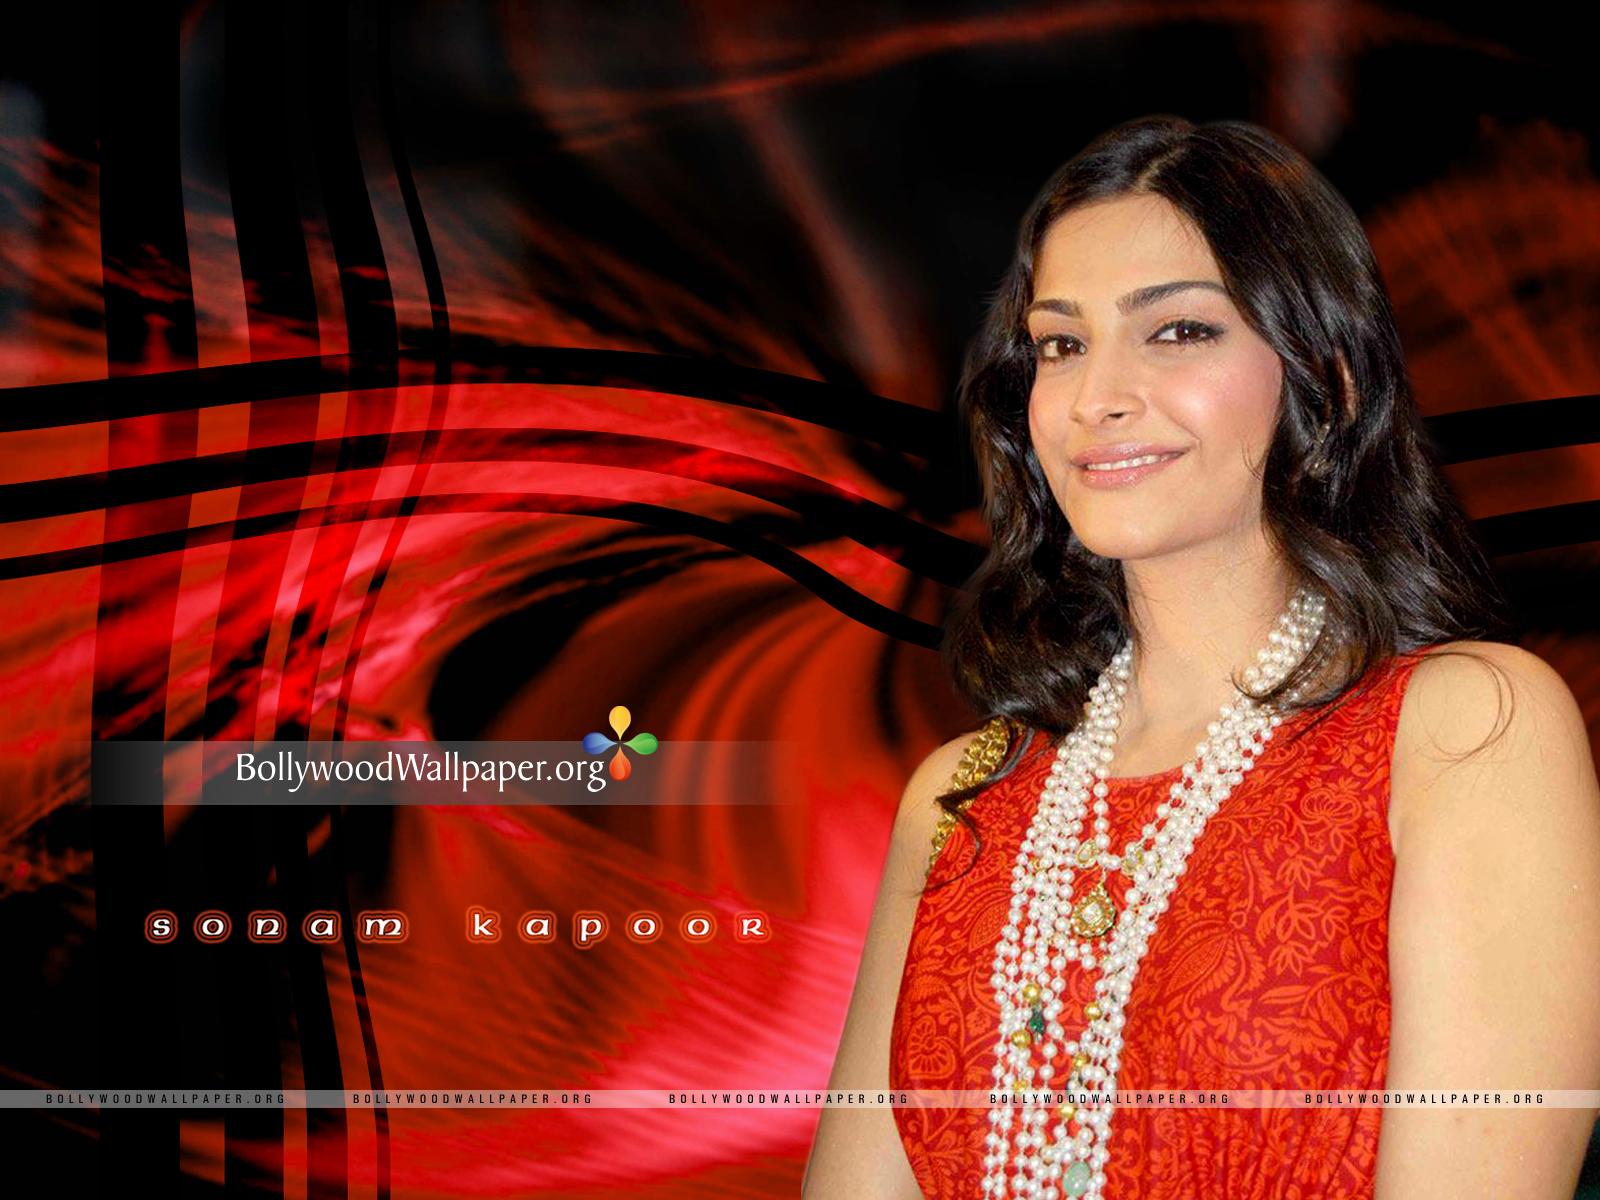 http://3.bp.blogspot.com/-o6SirduQkos/TnMyP7osoBI/AAAAAAAAGZI/_60HhWz6RIc/s1600/Beautiful+Sonam+Kapoor+HD+wallpaper+01.jpg